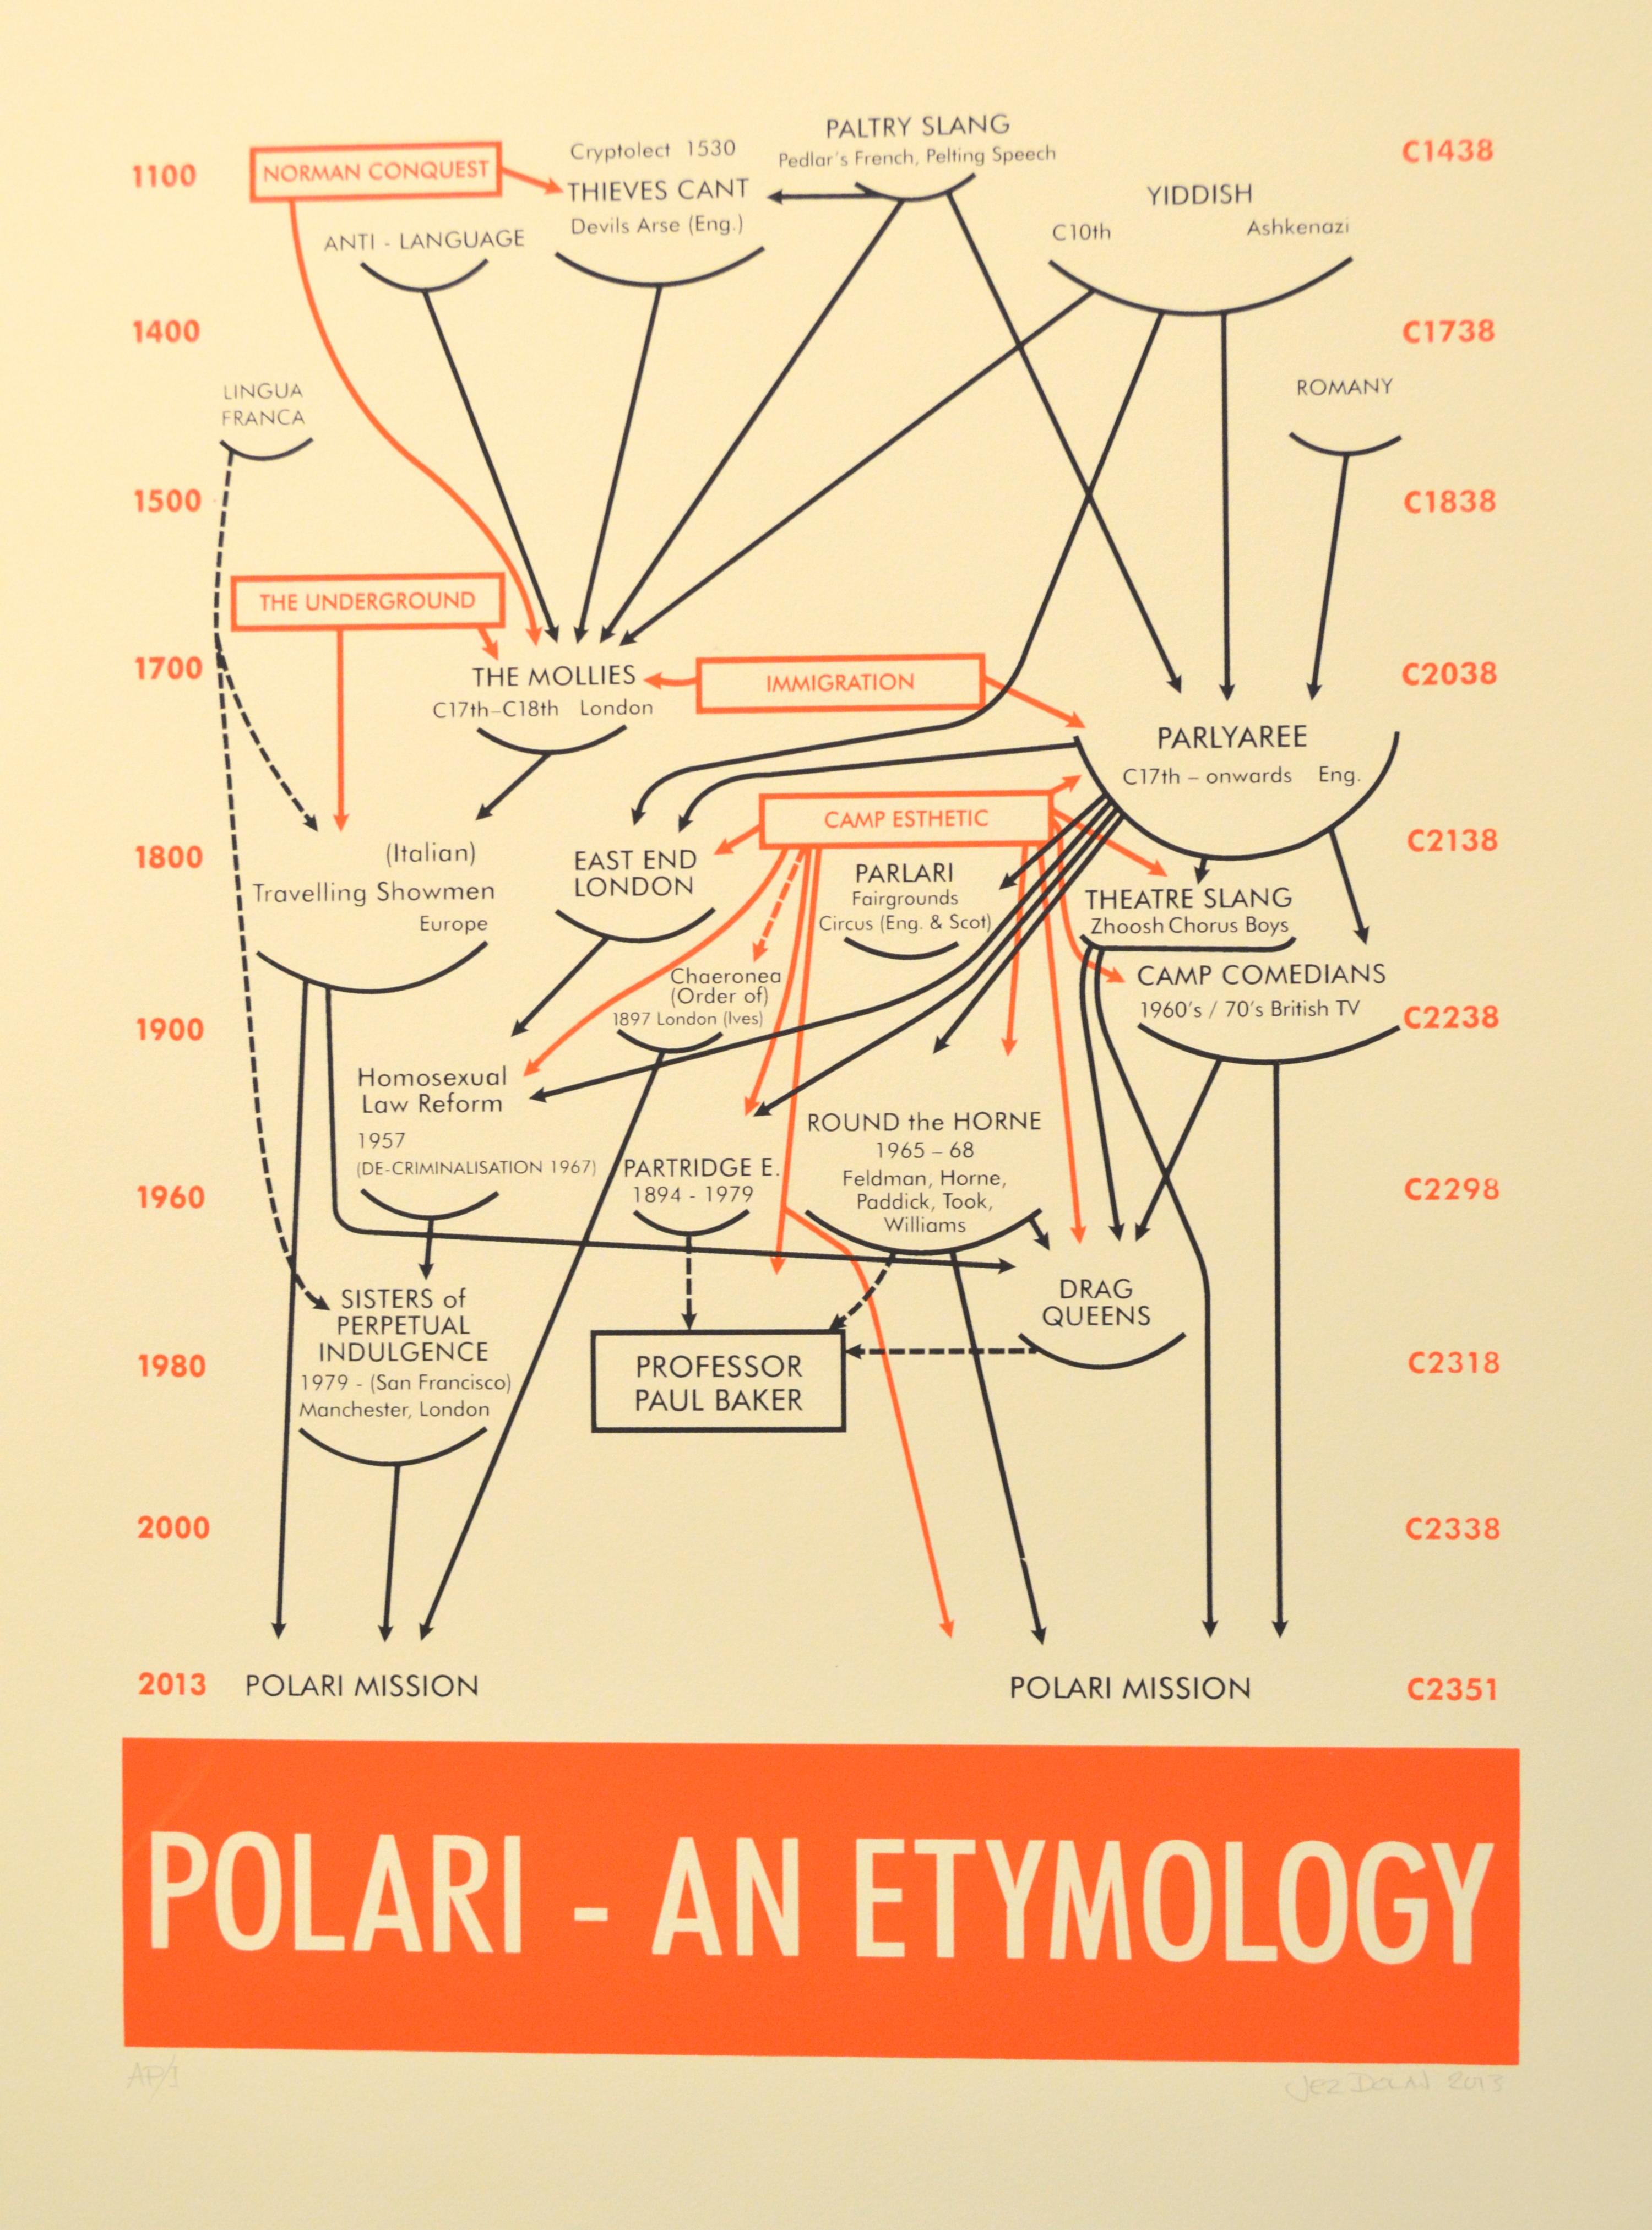 Dolan, Jez - Polari - An Etymology according to a diagramatic by Alfred H Bair - BUYGM.1592.2014.JPG